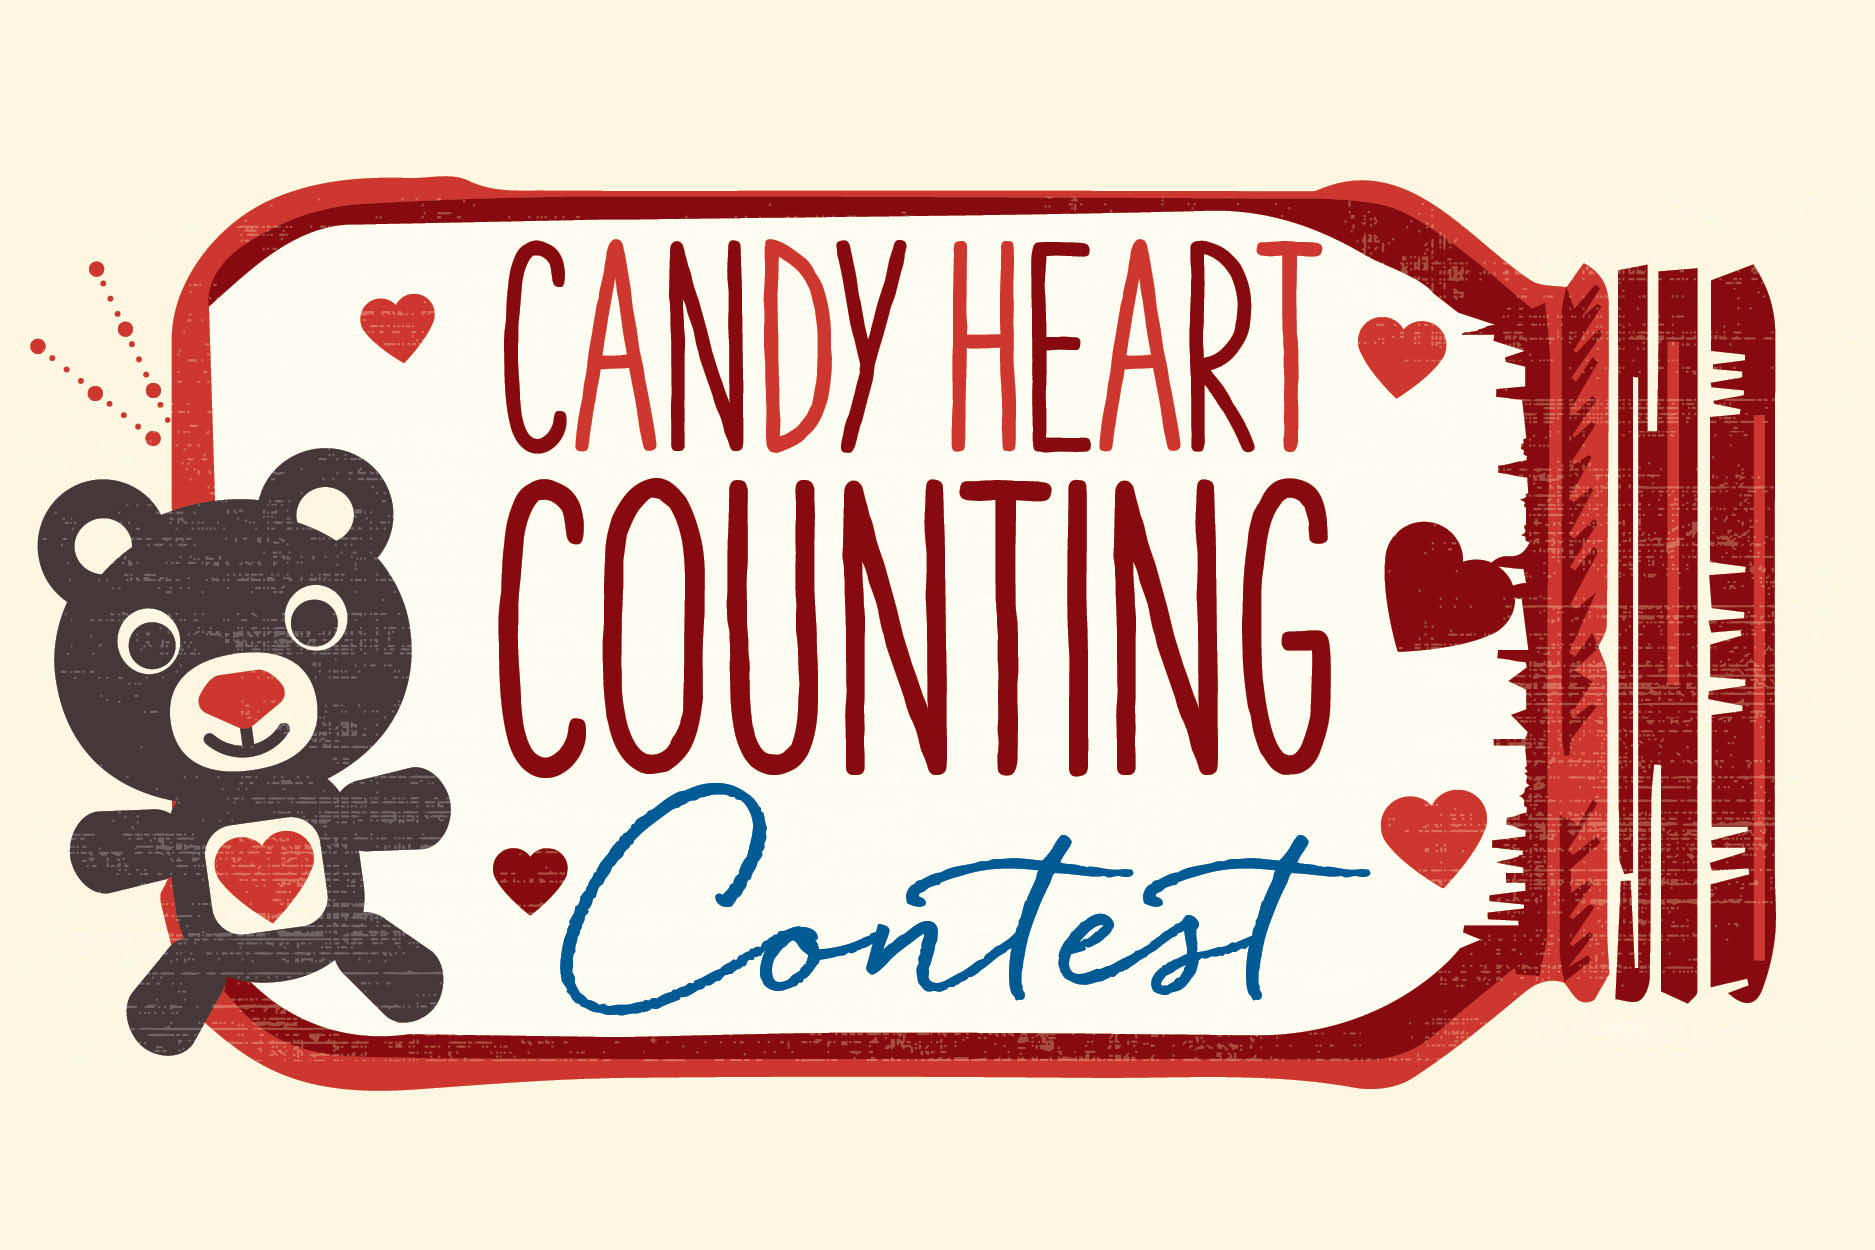 February Contest for Hanis Orthodontics